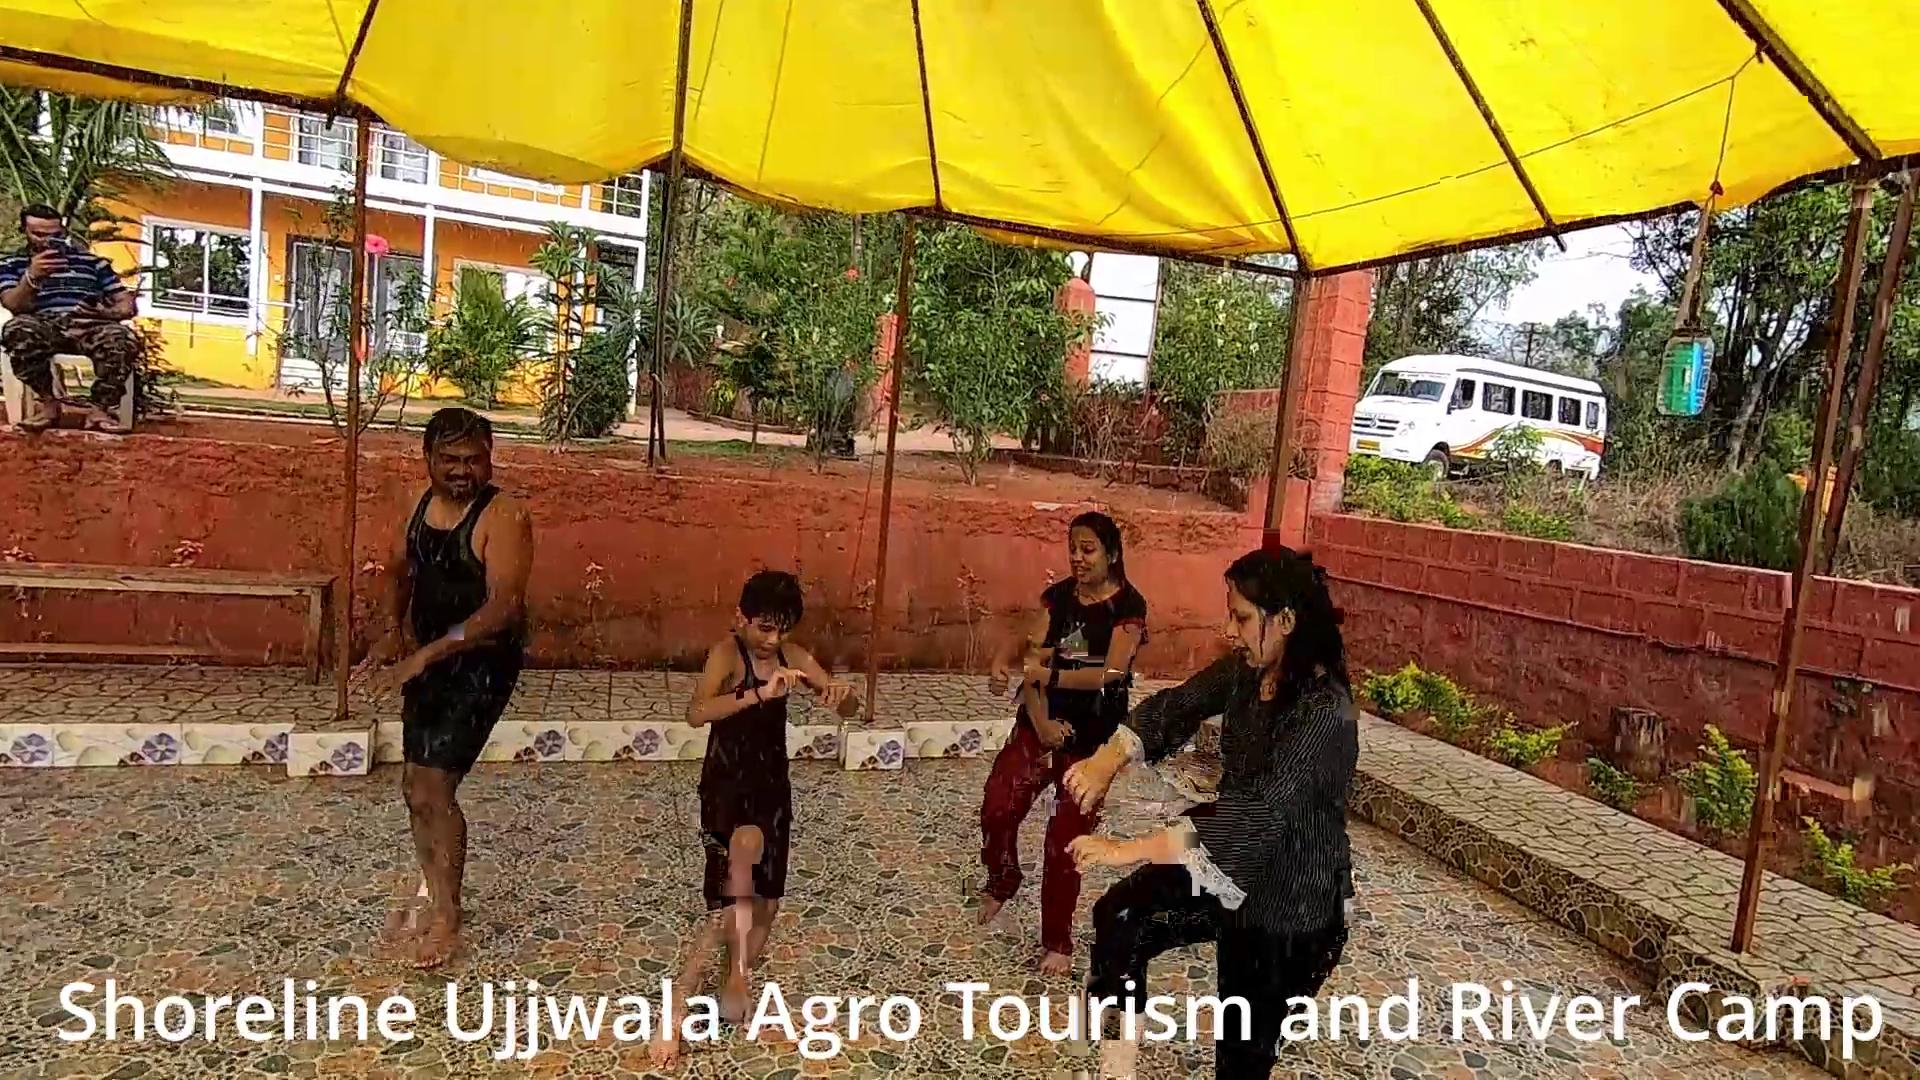 rain dance at Shoreline Ujjwala Agro Tourism and River Camp